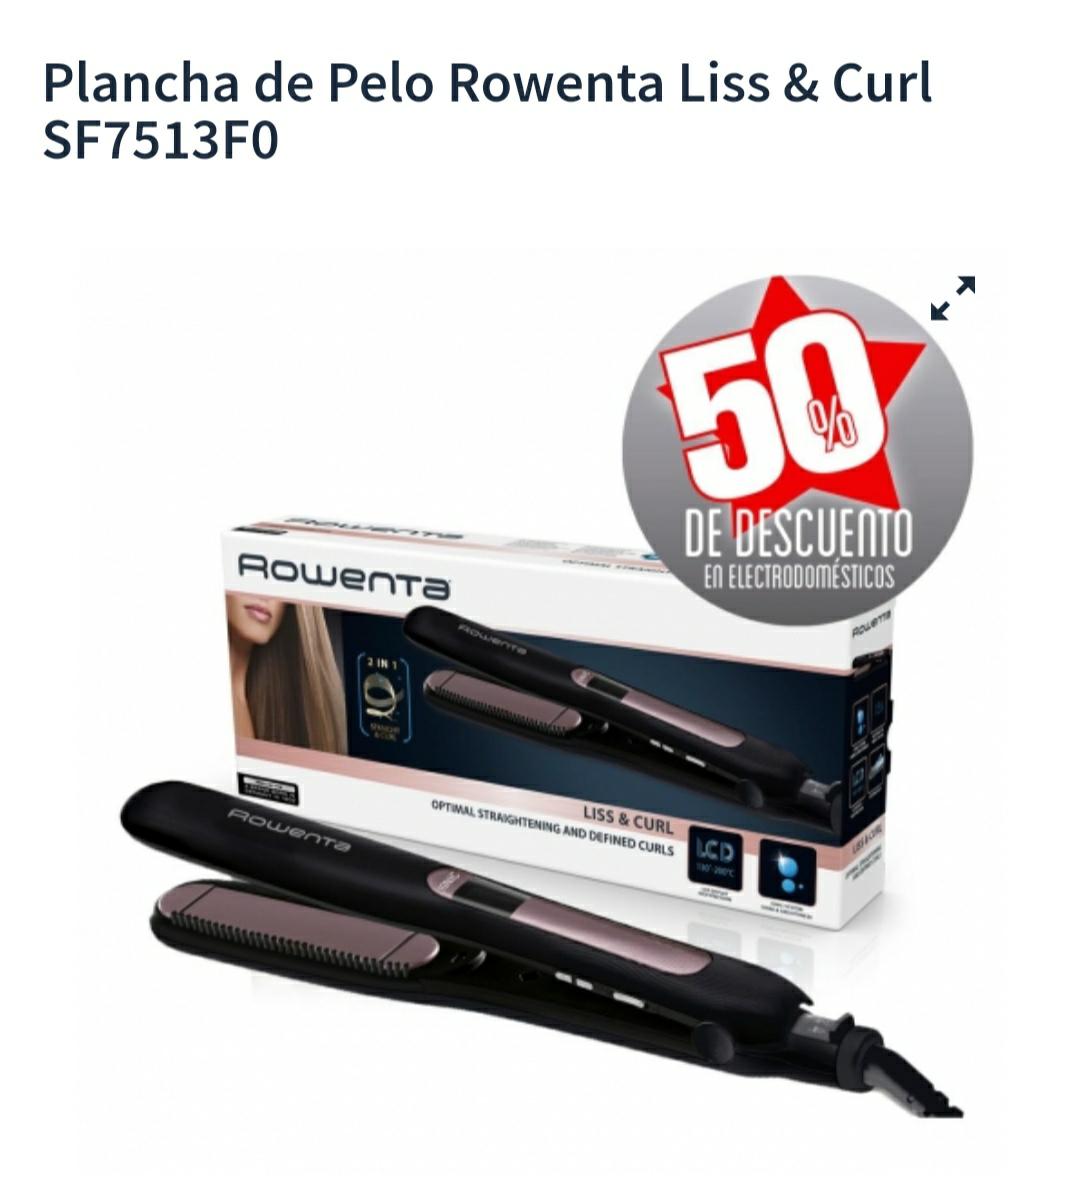 Plancha de Pelo Rowenta Liss & Curl SF7513F0